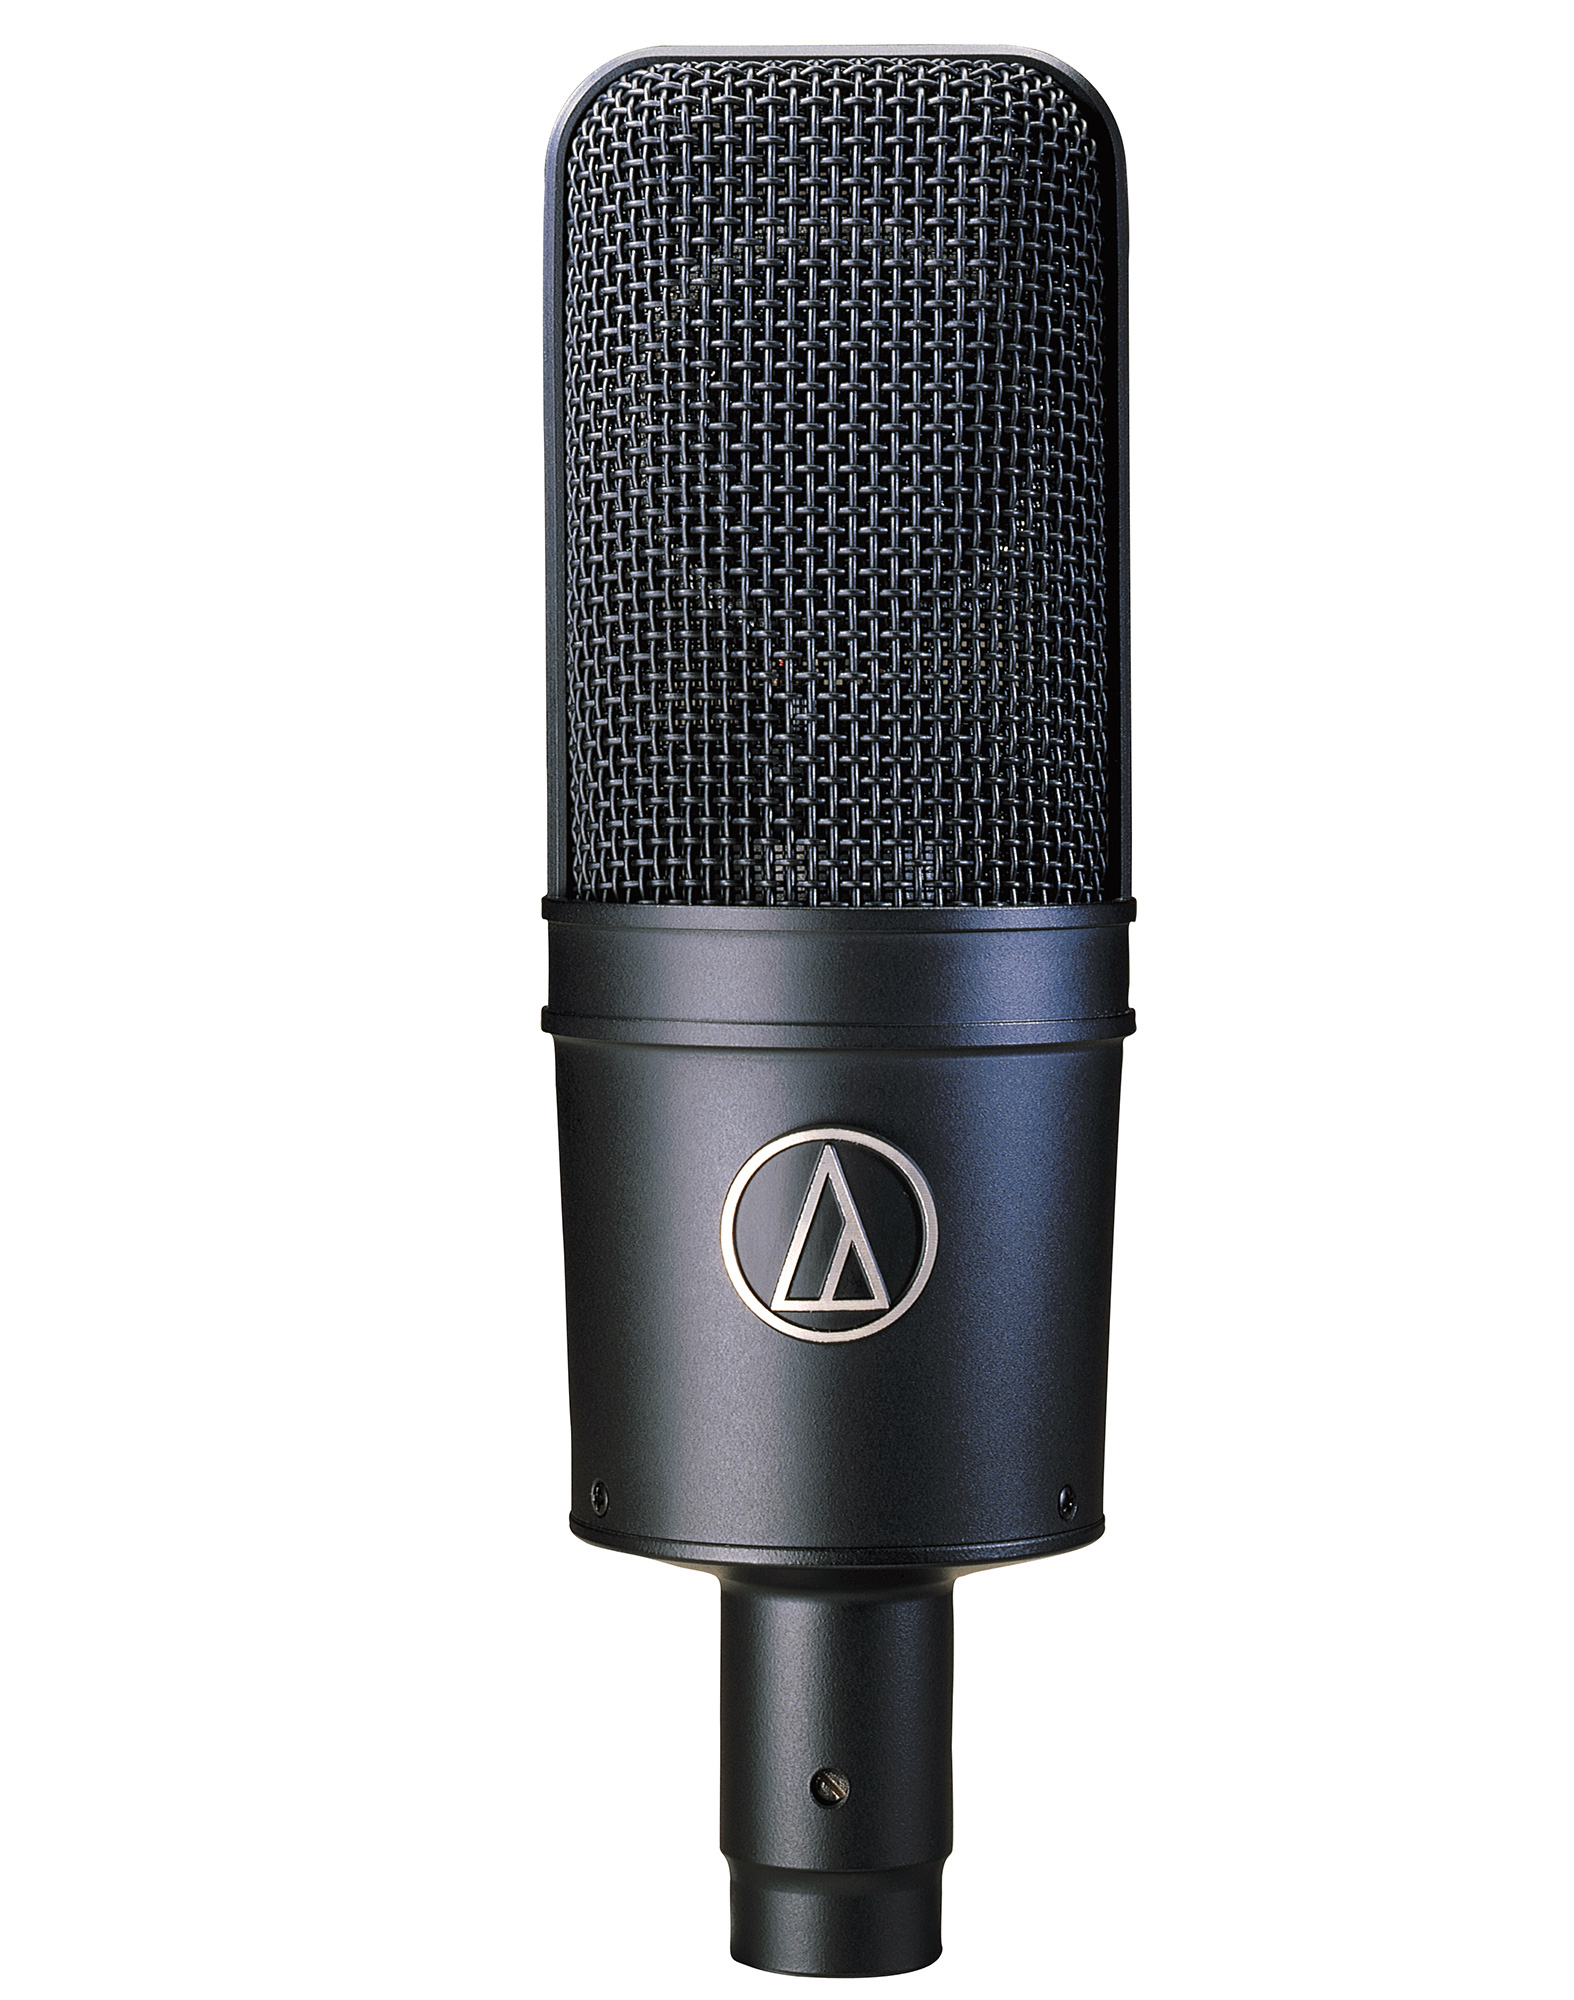 audio technica 4033 cardioid studio condenser mic. Black Bedroom Furniture Sets. Home Design Ideas